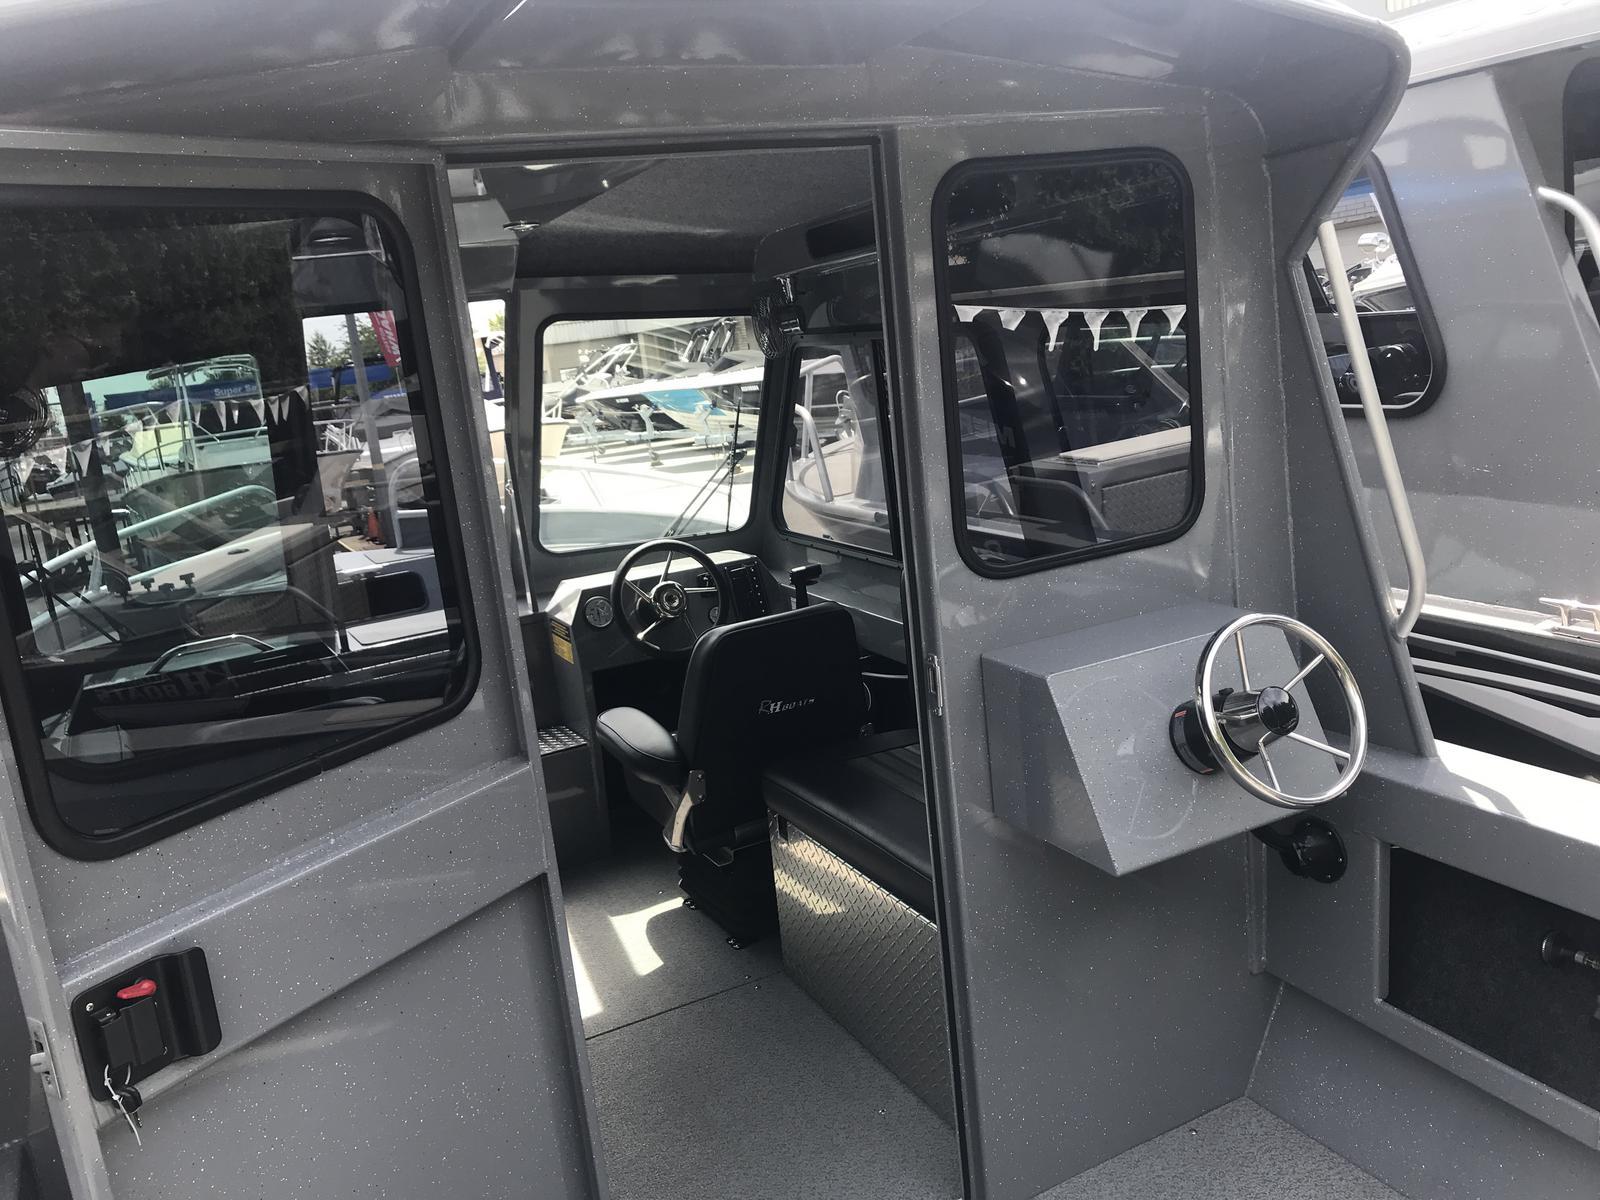 2017 RH Aluminum Boats boat for sale, model of the boat is 21 Sea Hawk Coastal & Image # 3 of 6